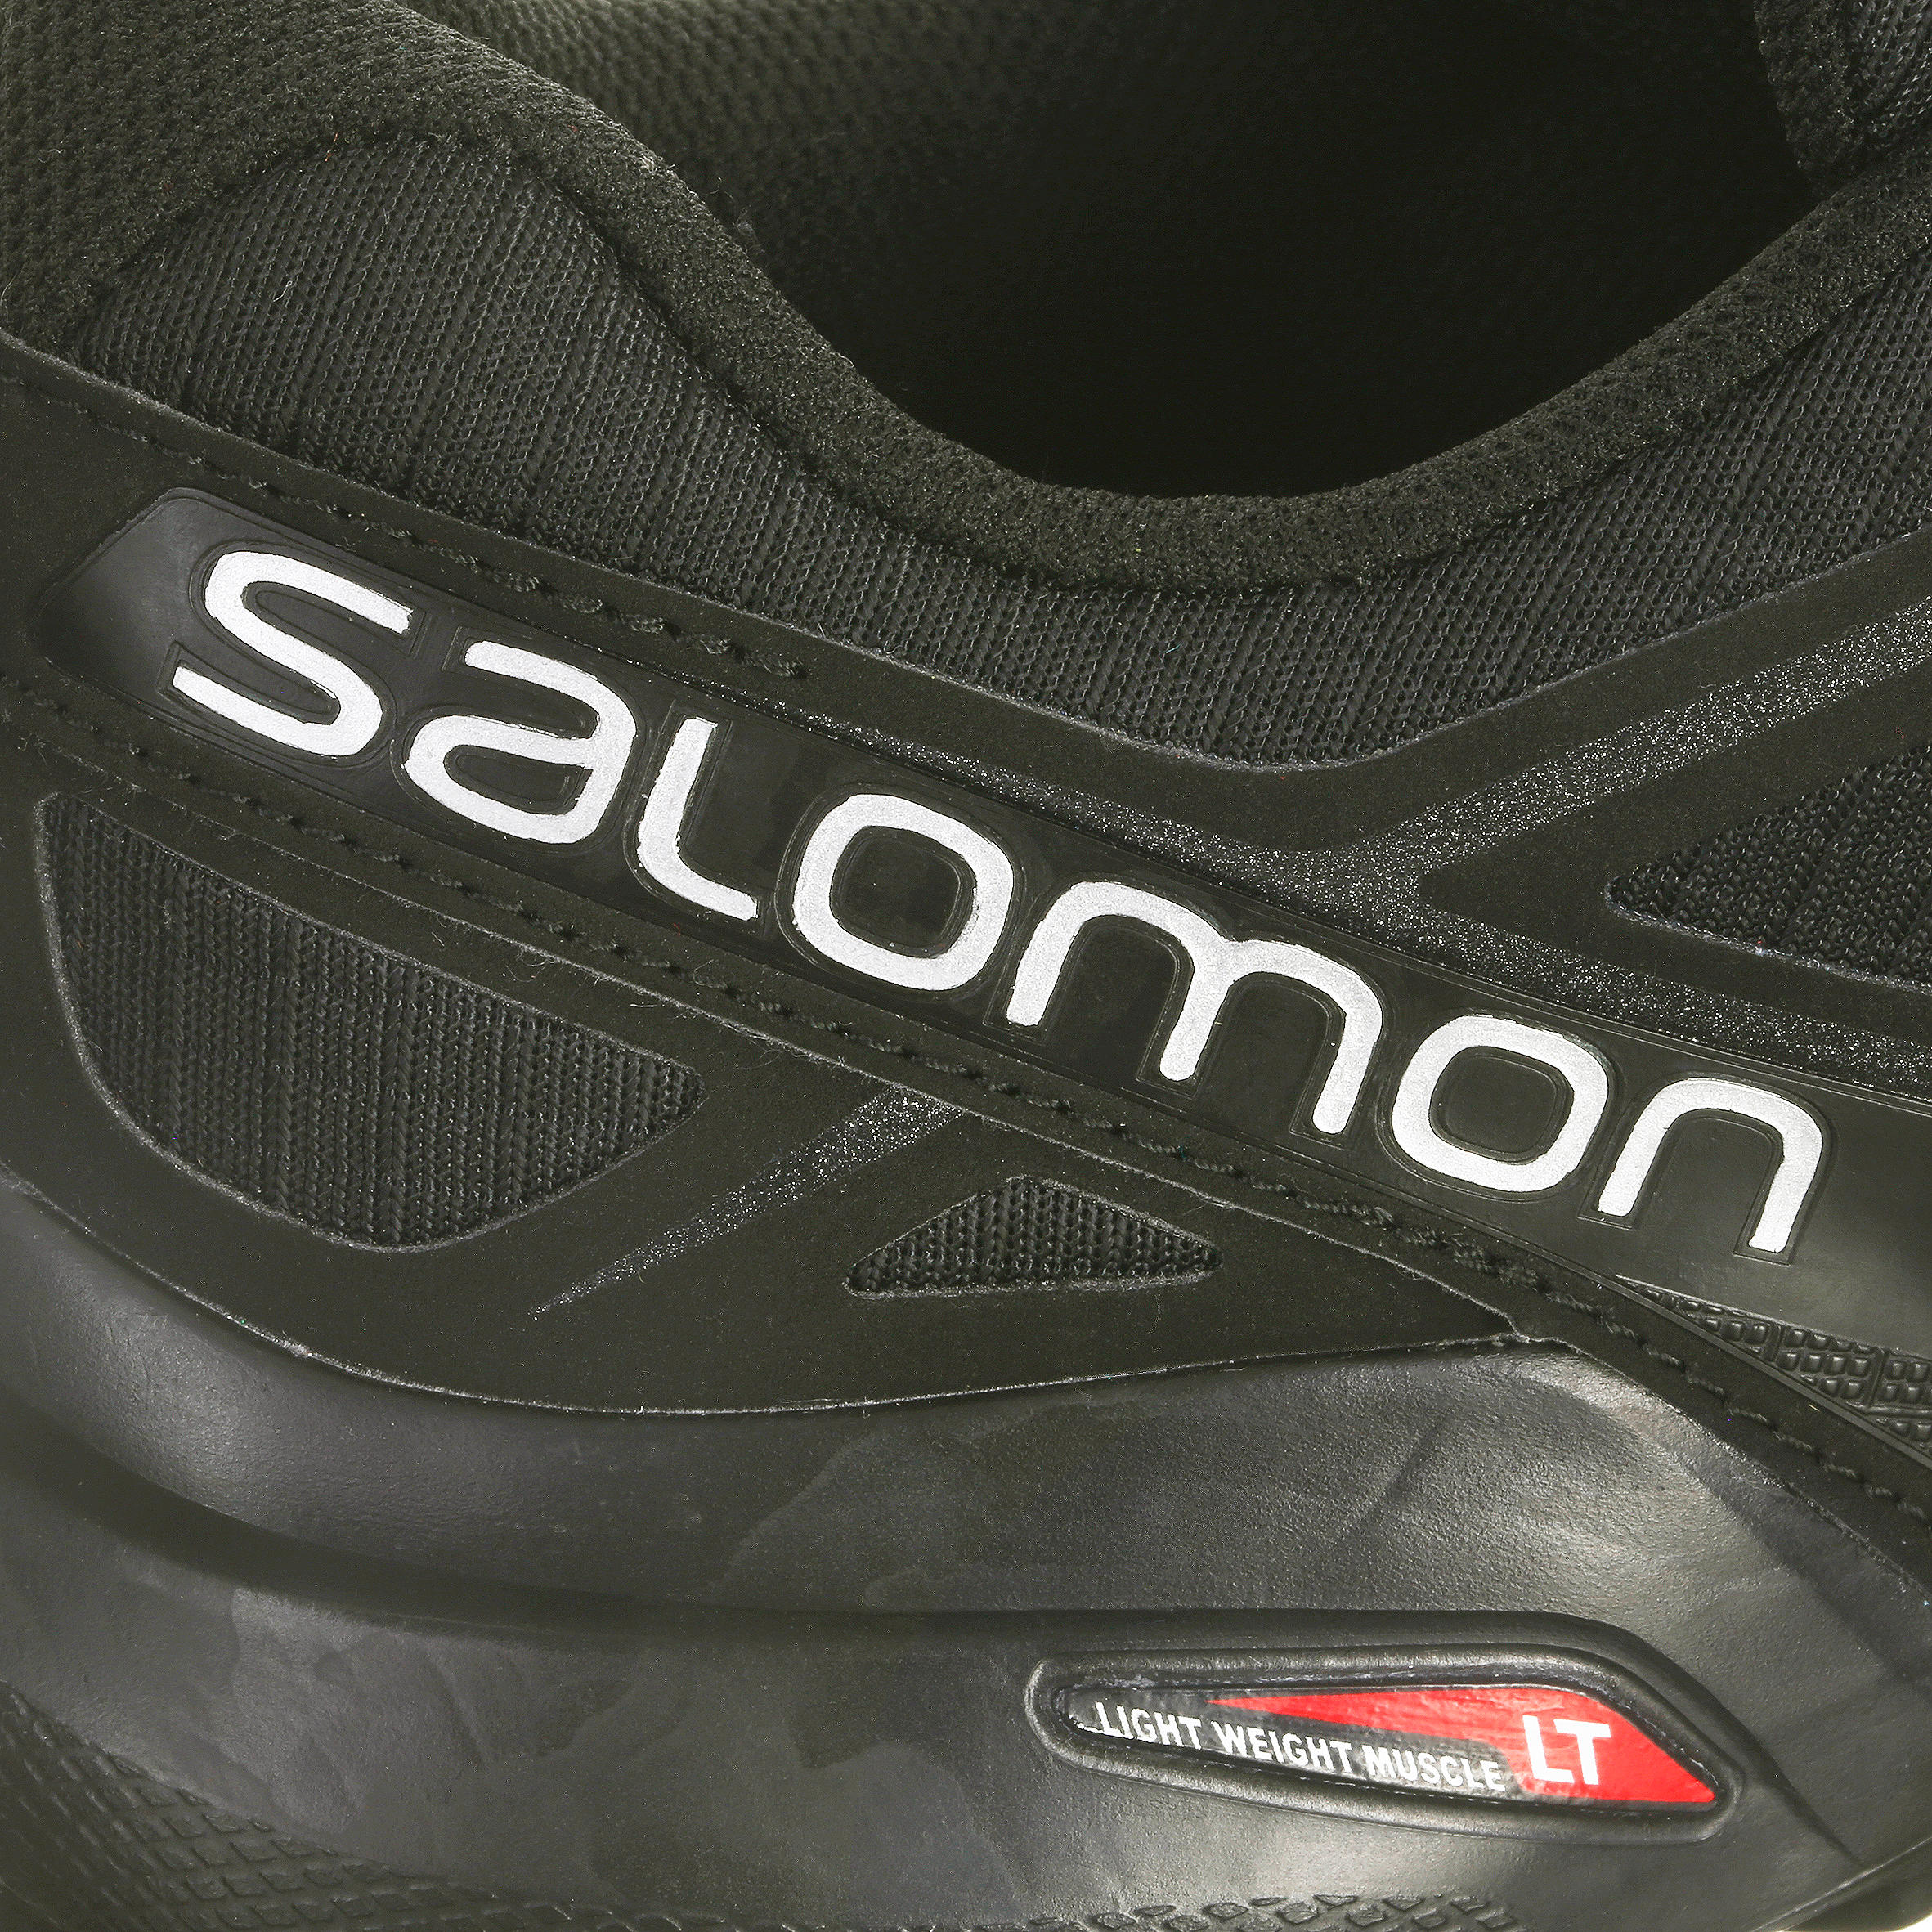 Trail Noir Running Homme Salomon Chaussure Speedcross 4 wO0nPk8